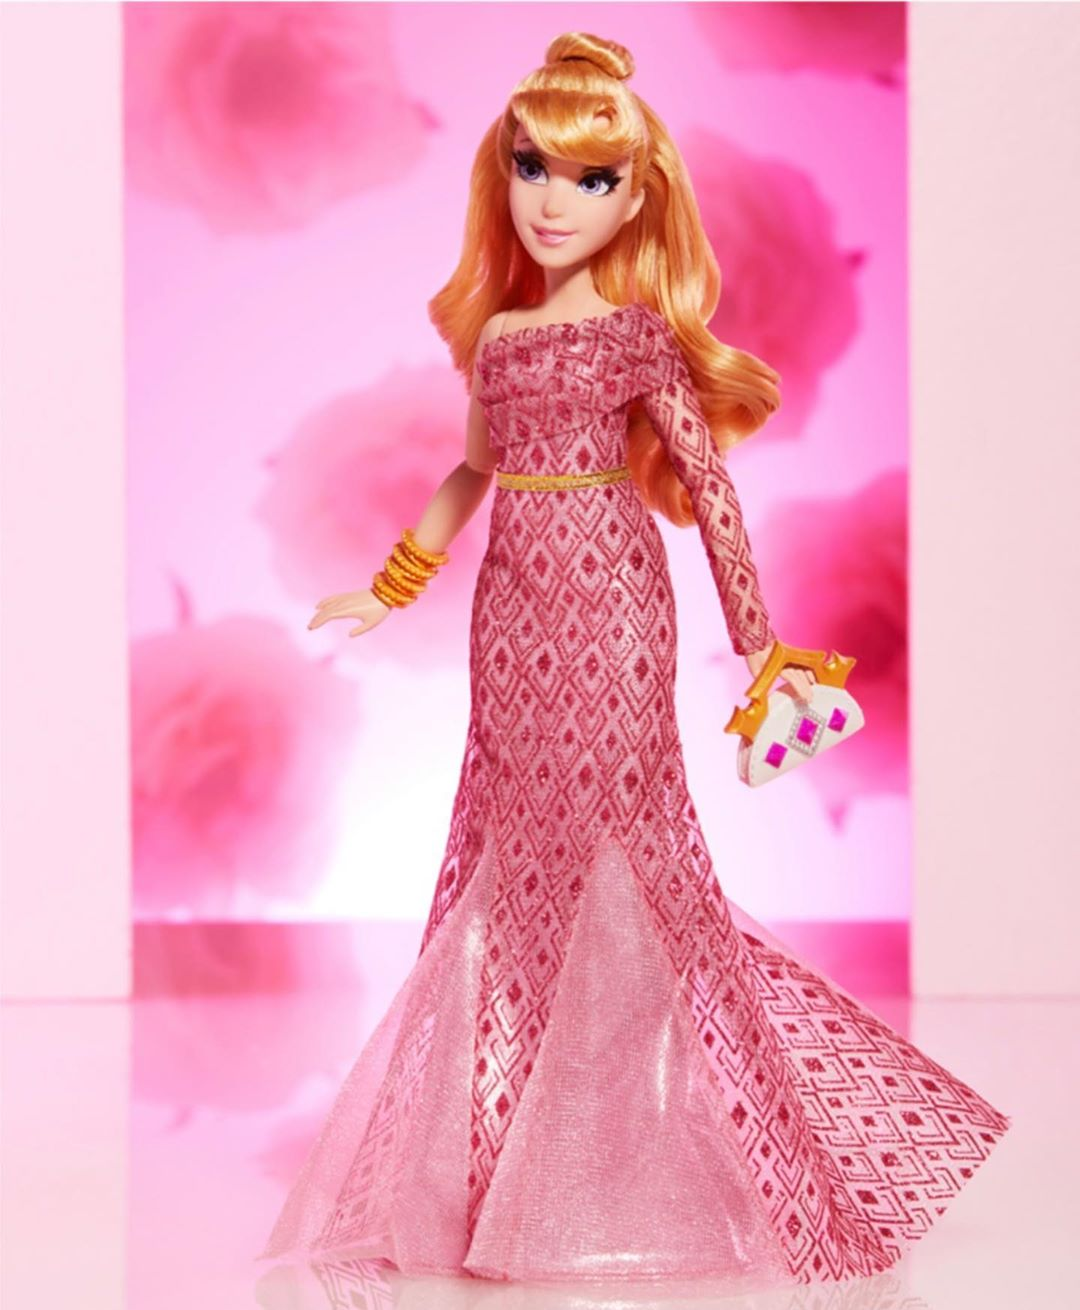 Promo Images Of Princess Jasmine And Aurora Style Series Dolls